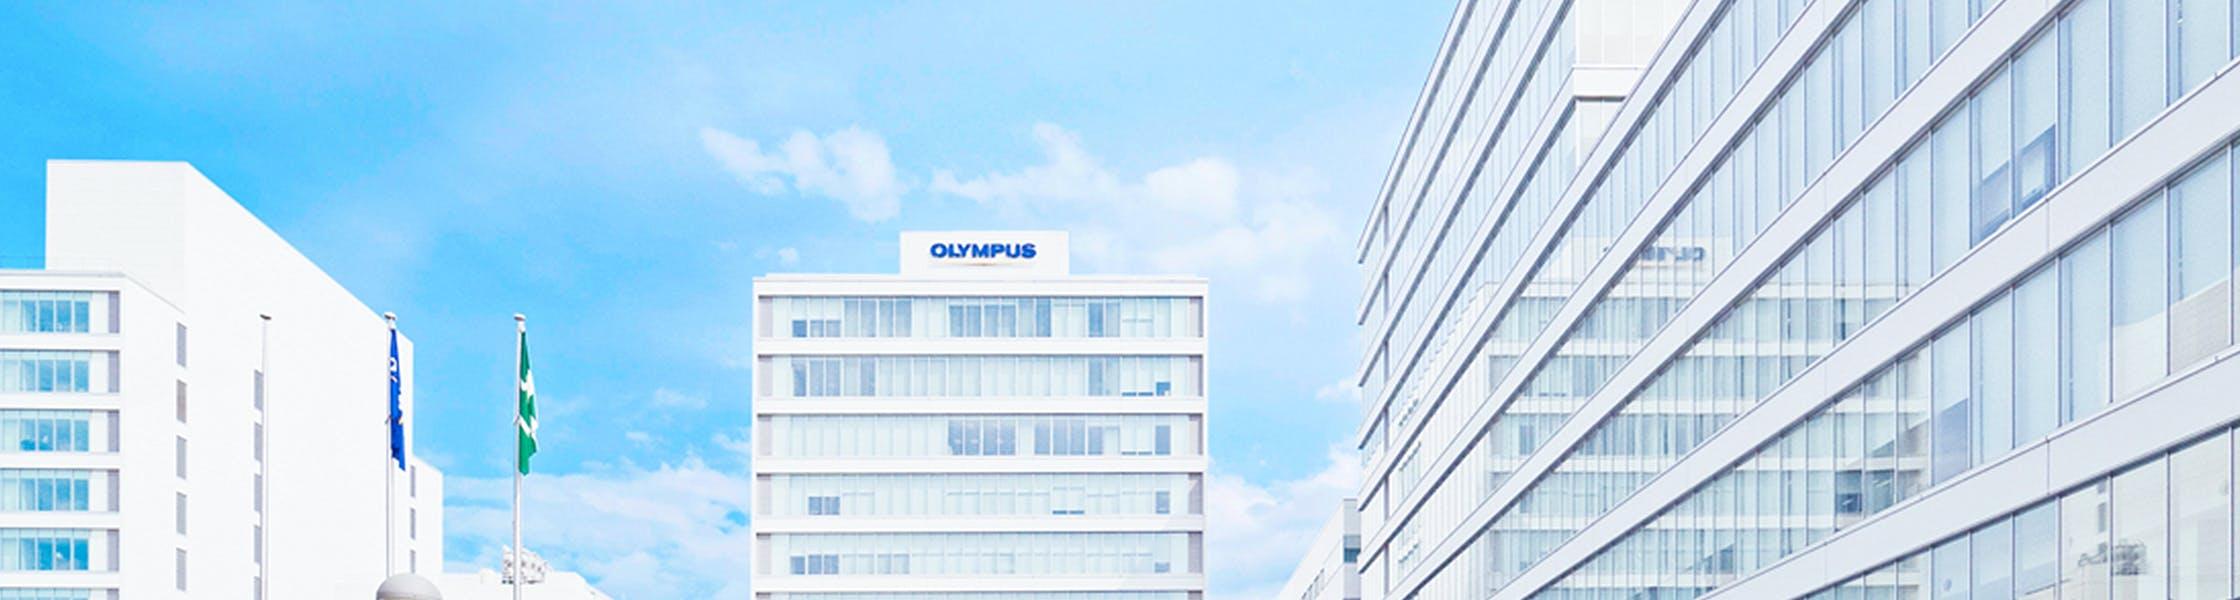 Olympus 1120x300 2x.jpg?ixlib=rails 3.0